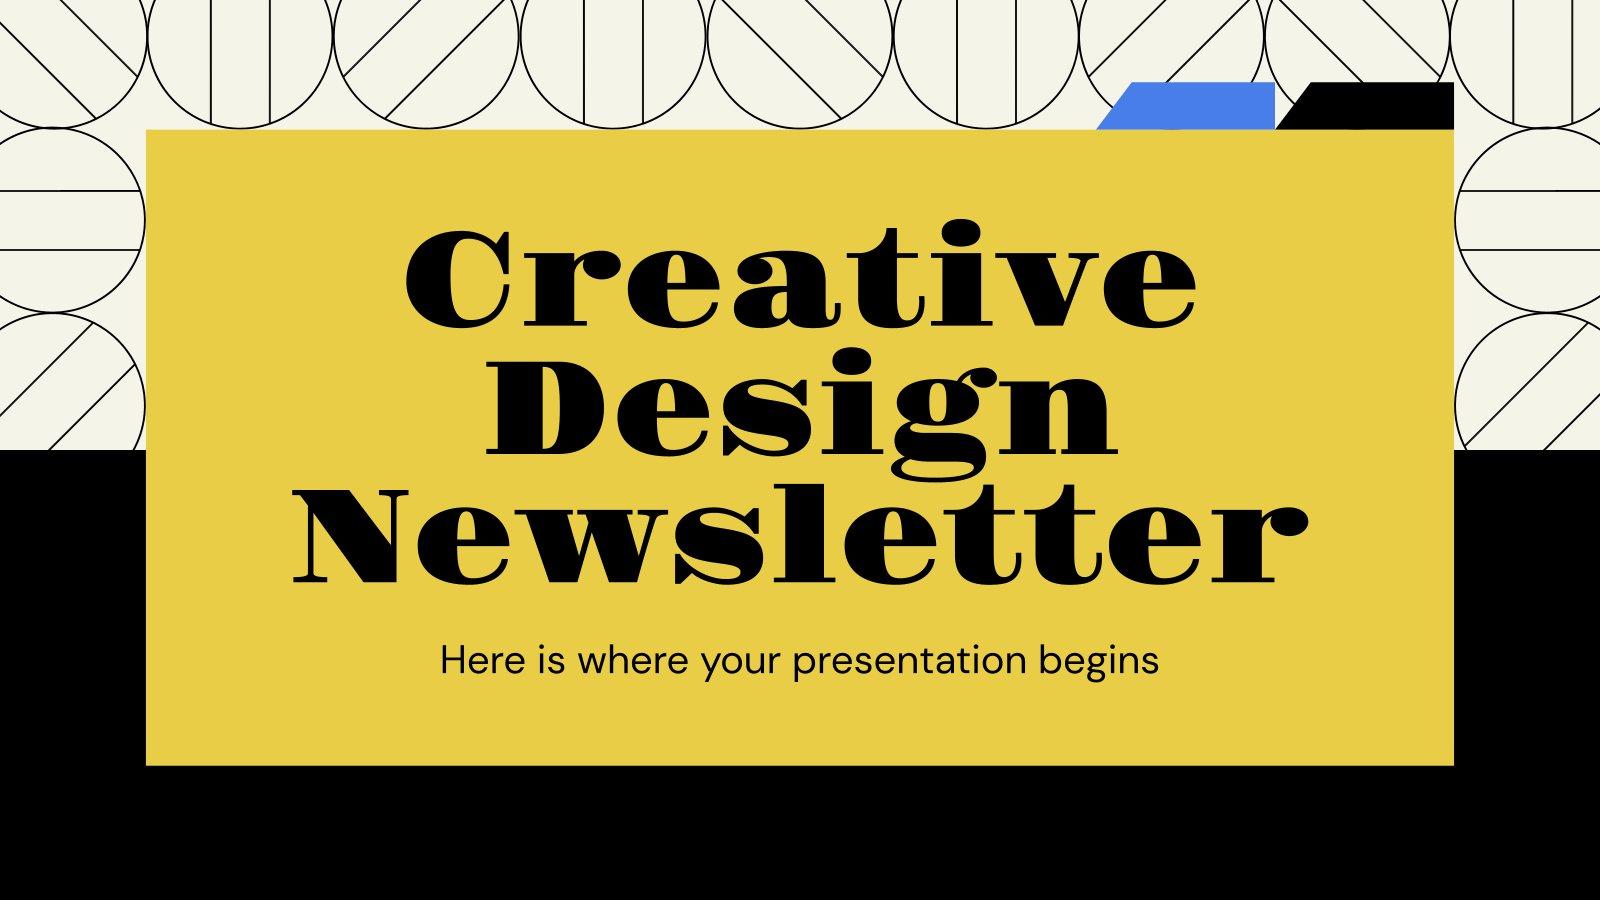 Creative Design Newsletter presentation template